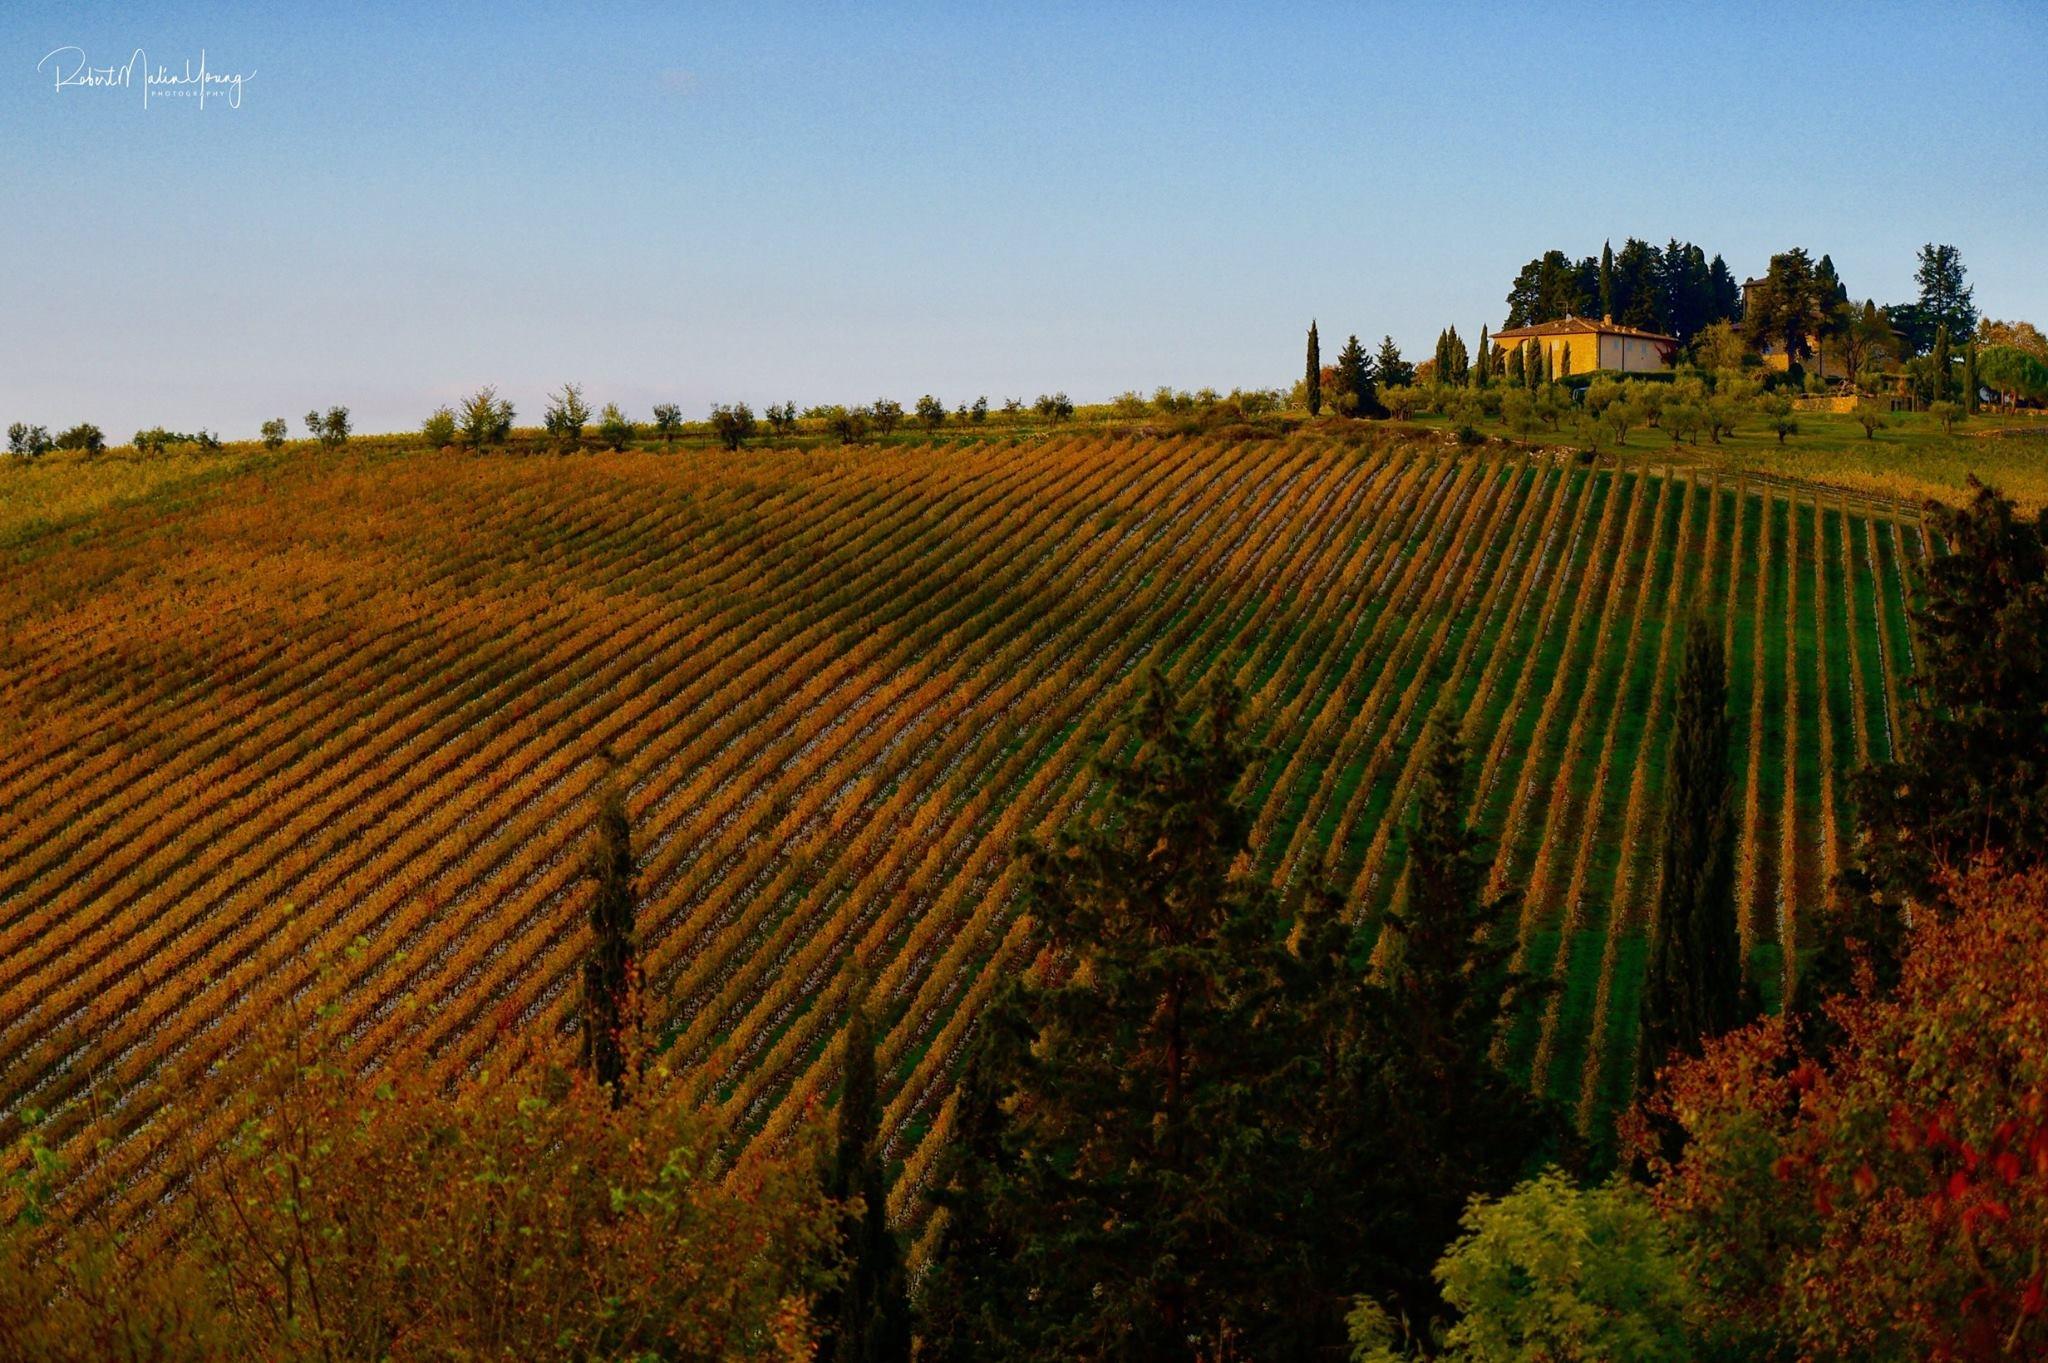 Bella Toscana 2018 by Robert Malin Young